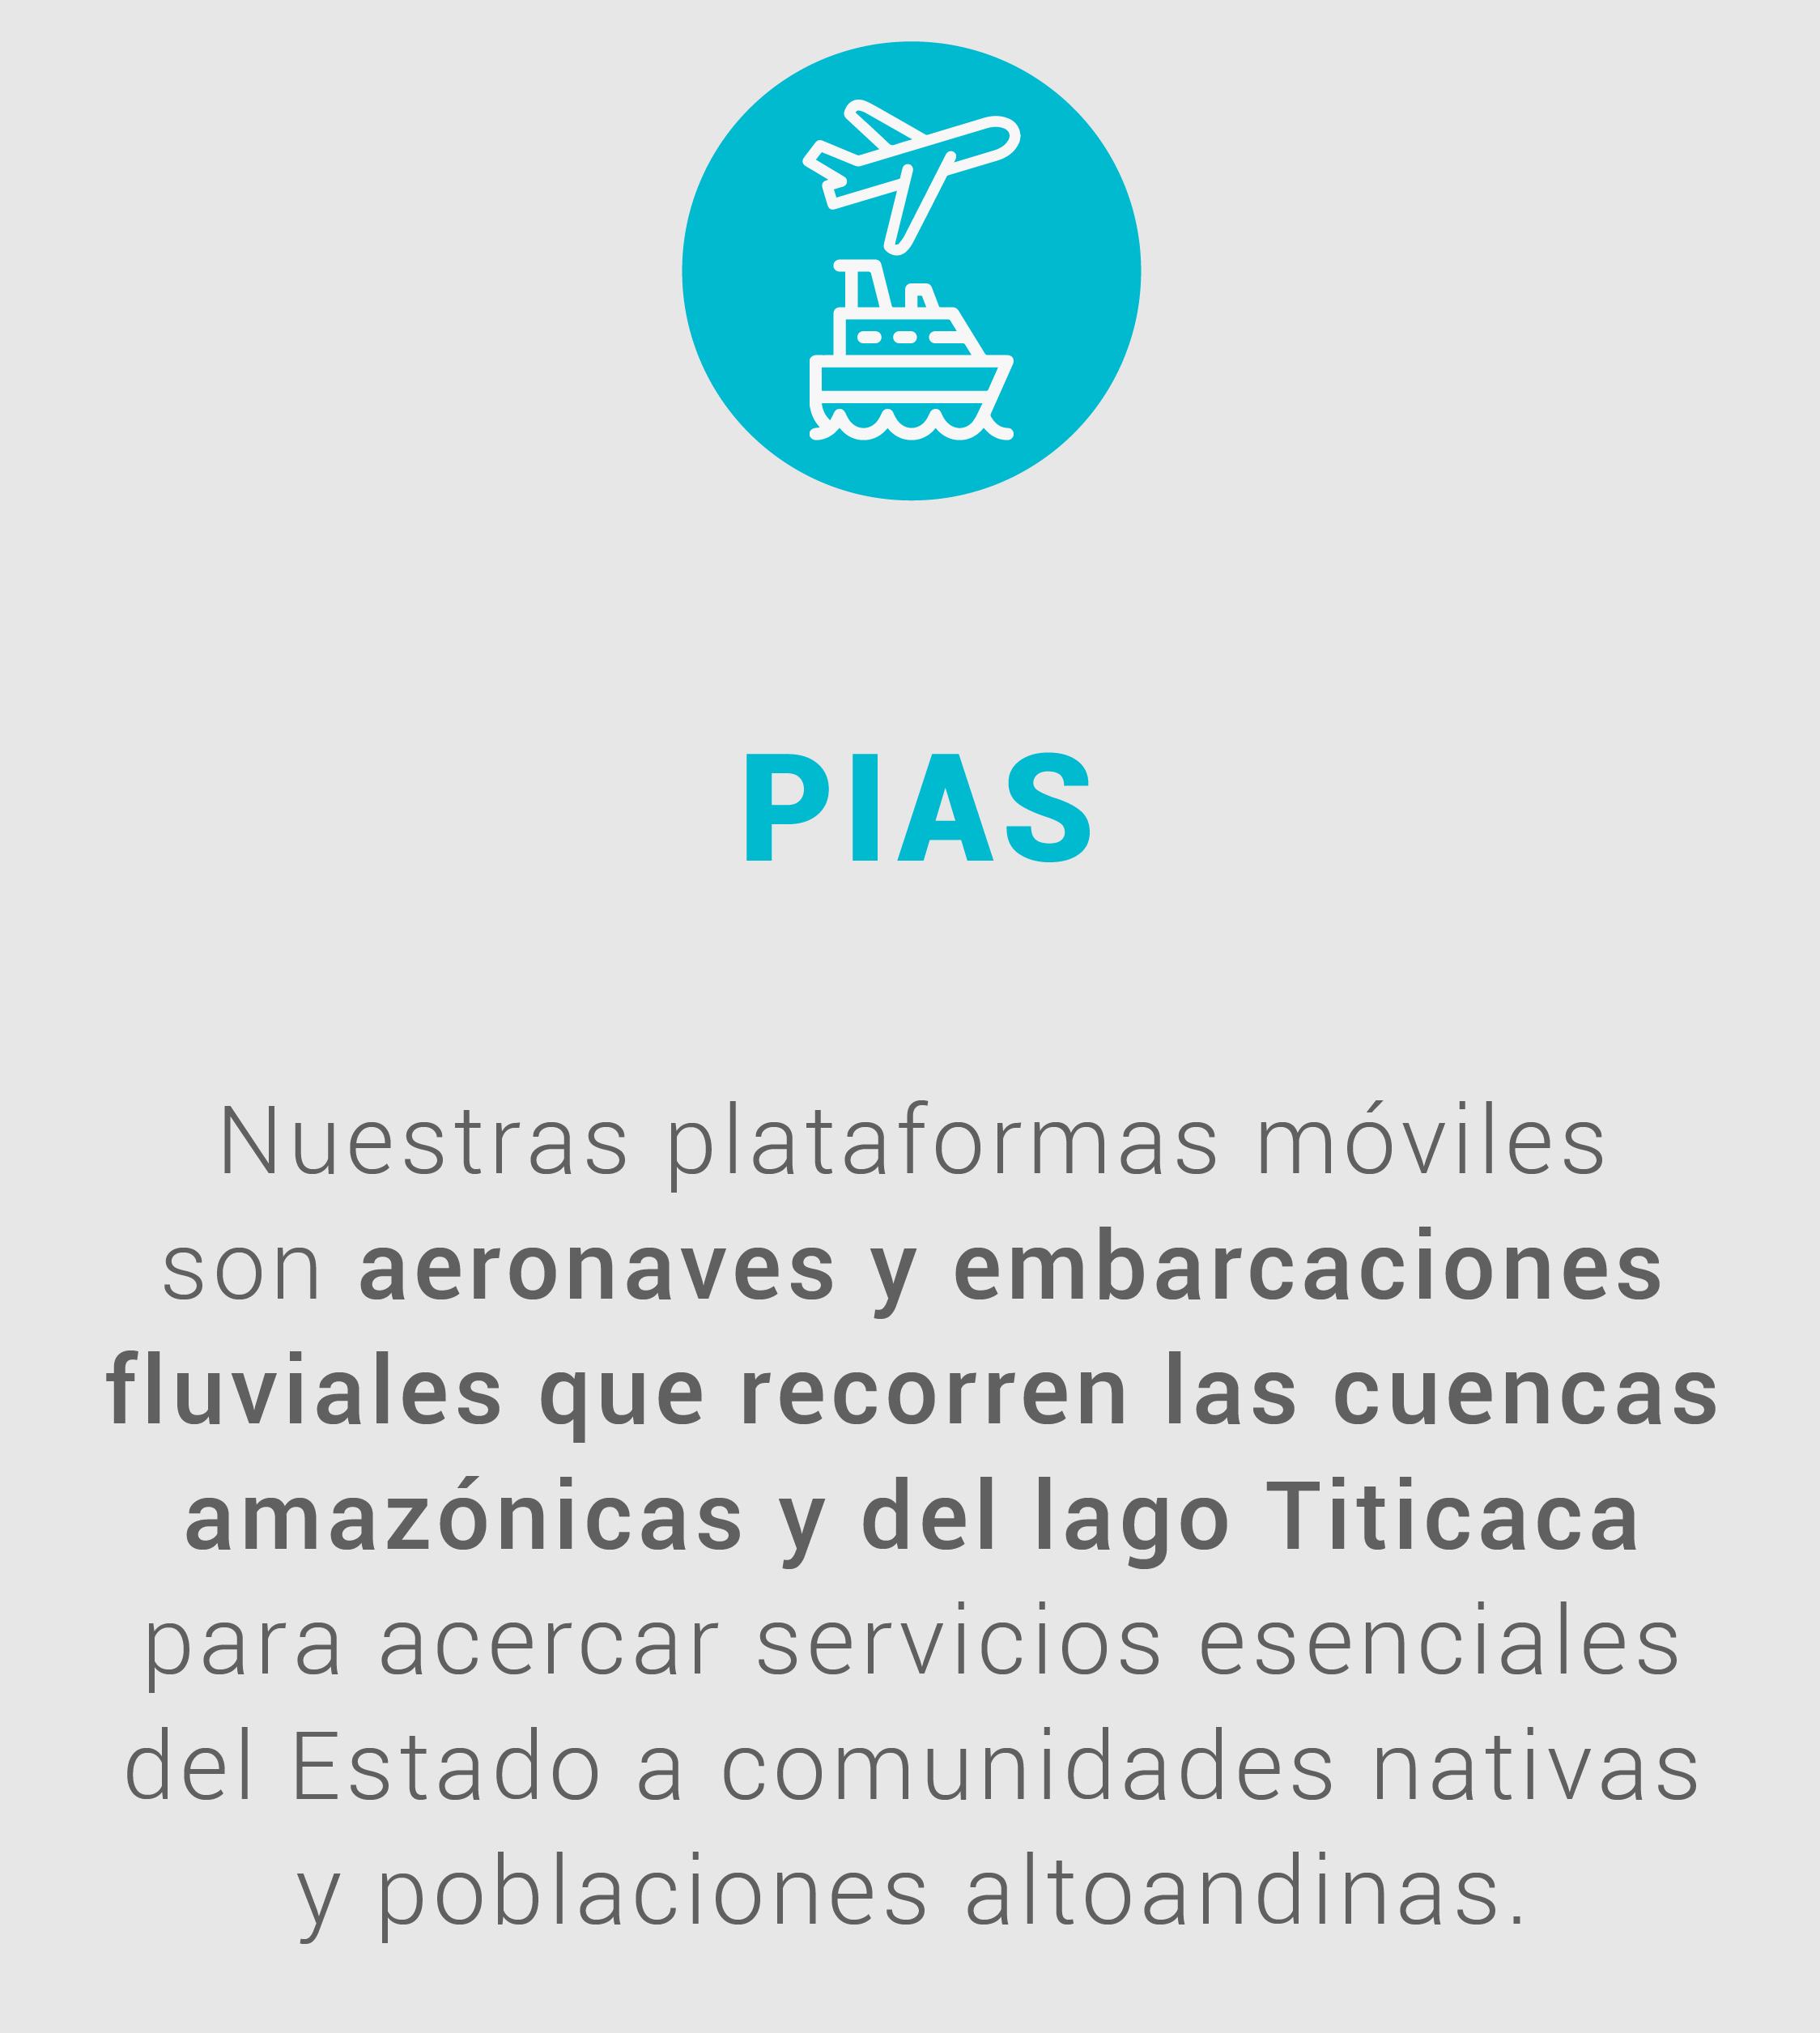 banco herramientas - Pias